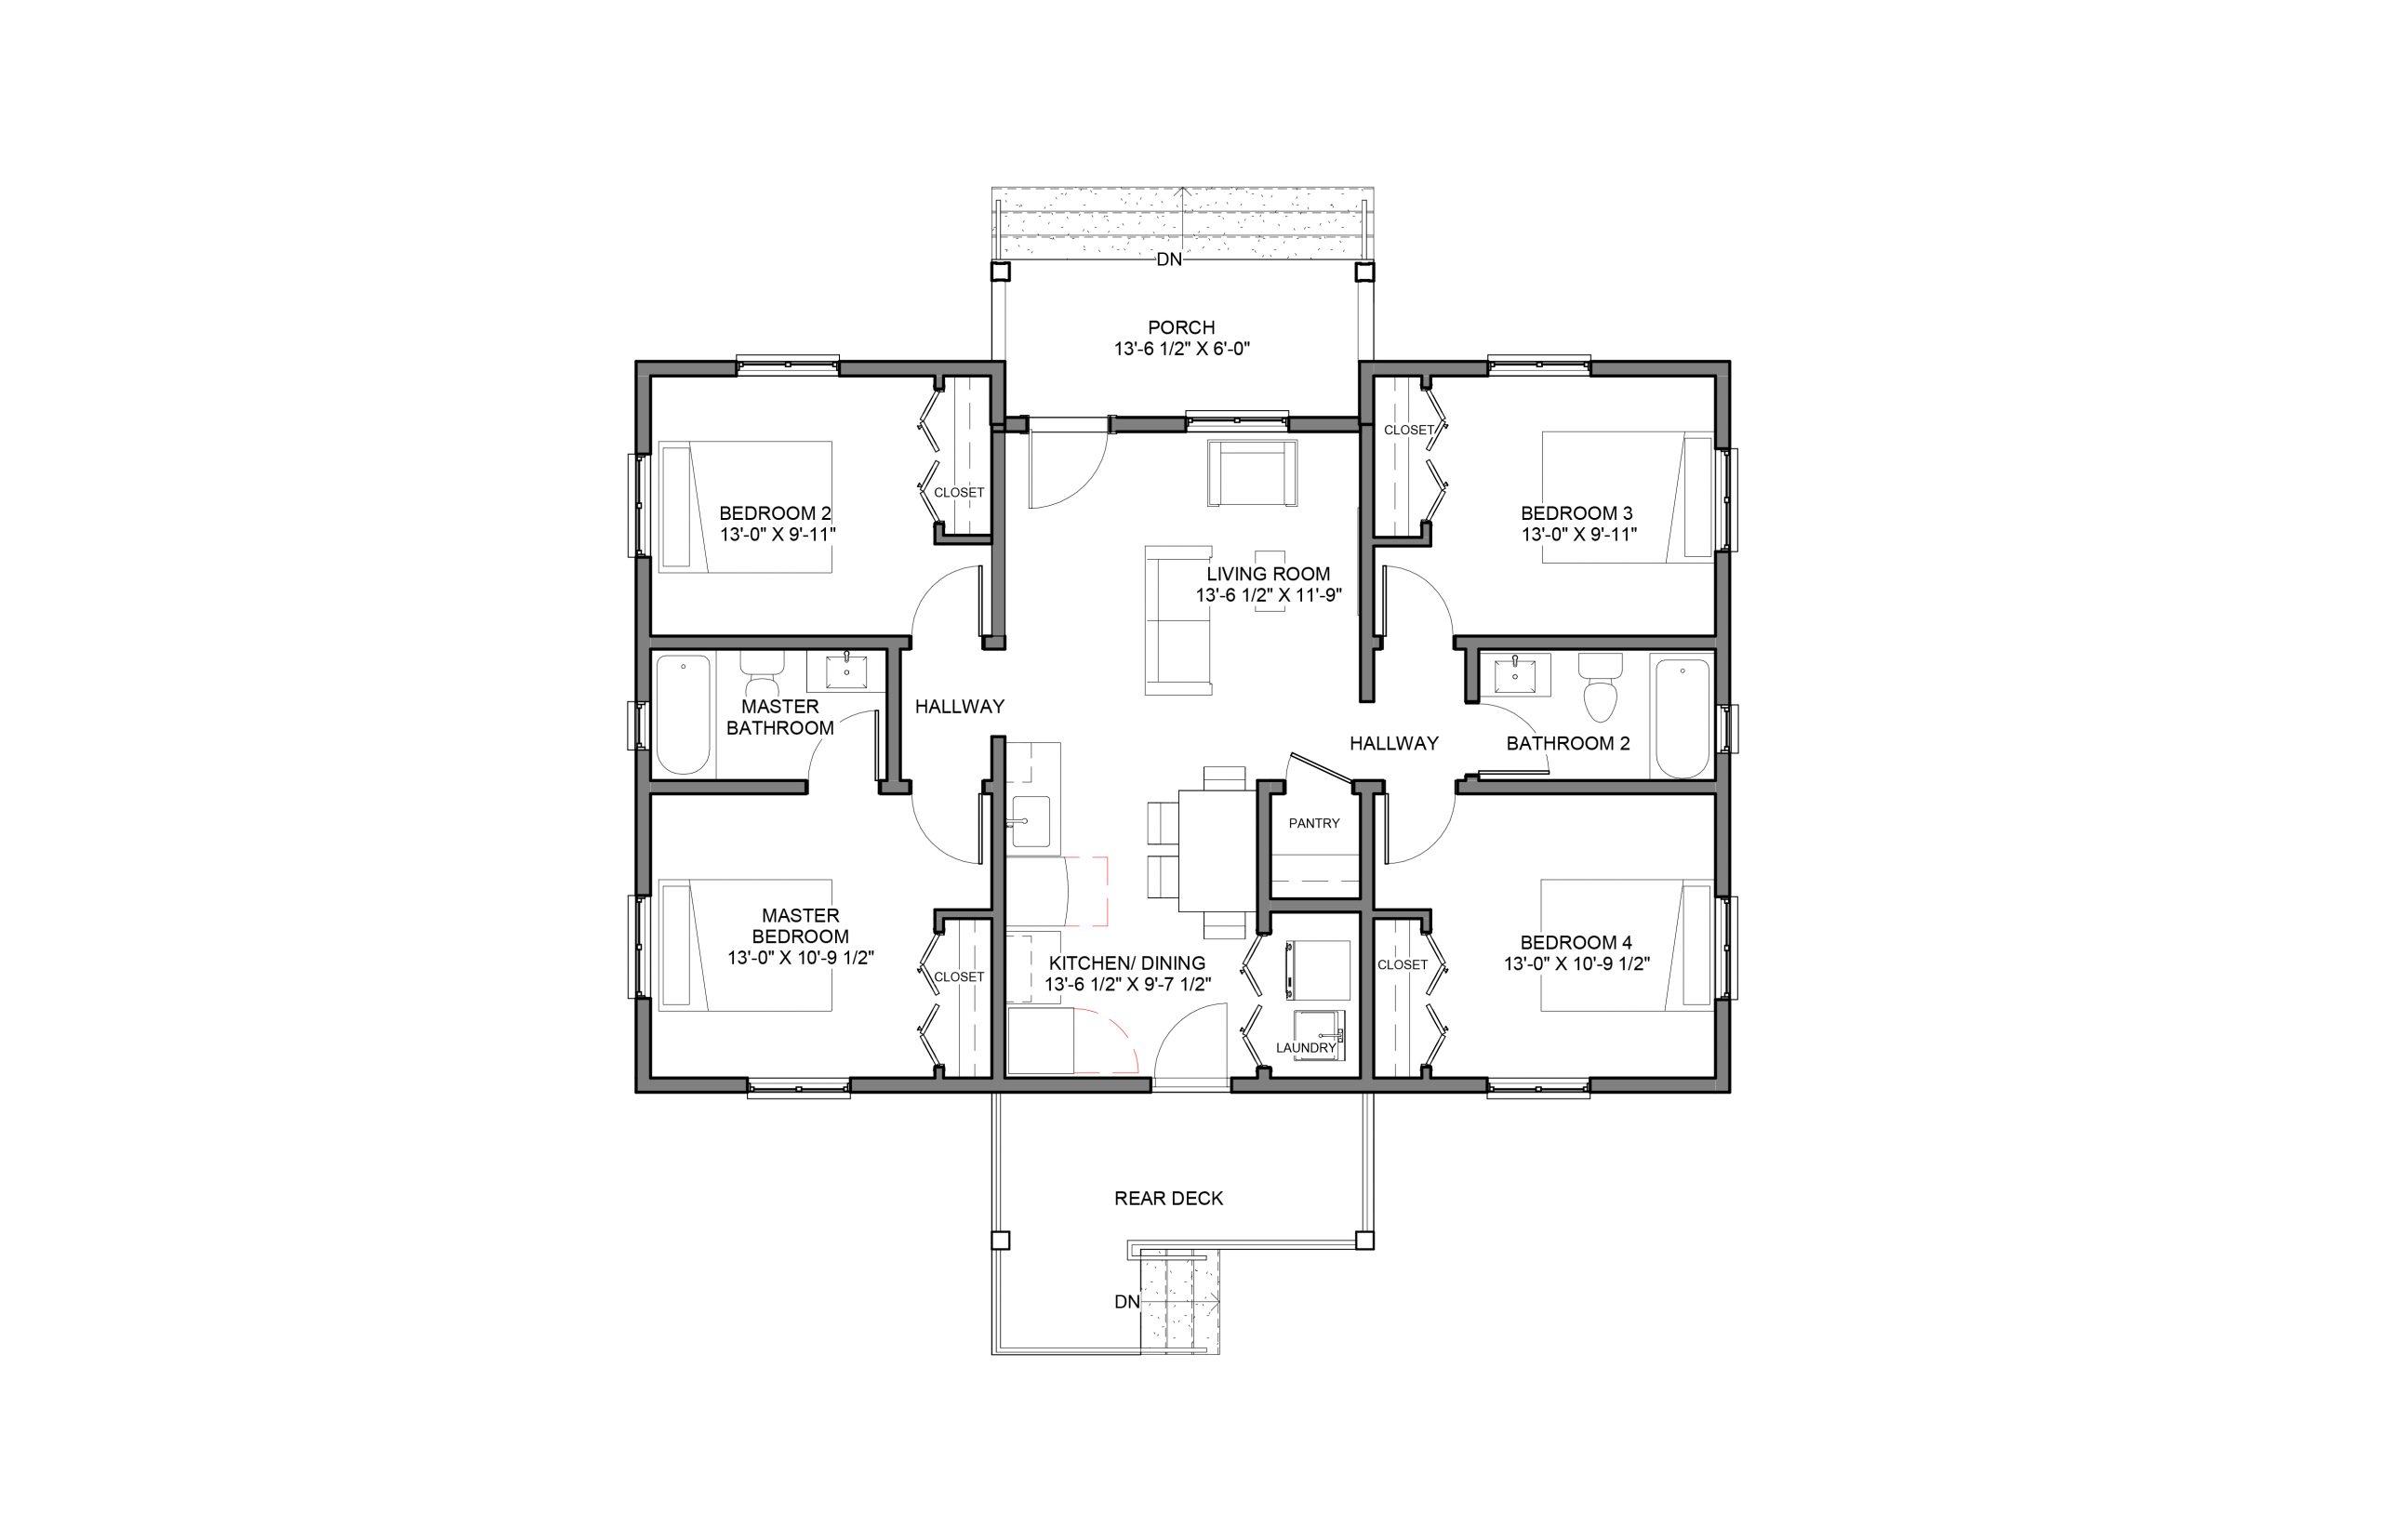 Beacon 4Bed 2Bath Option 2 Floor Plan 1340+SQFT